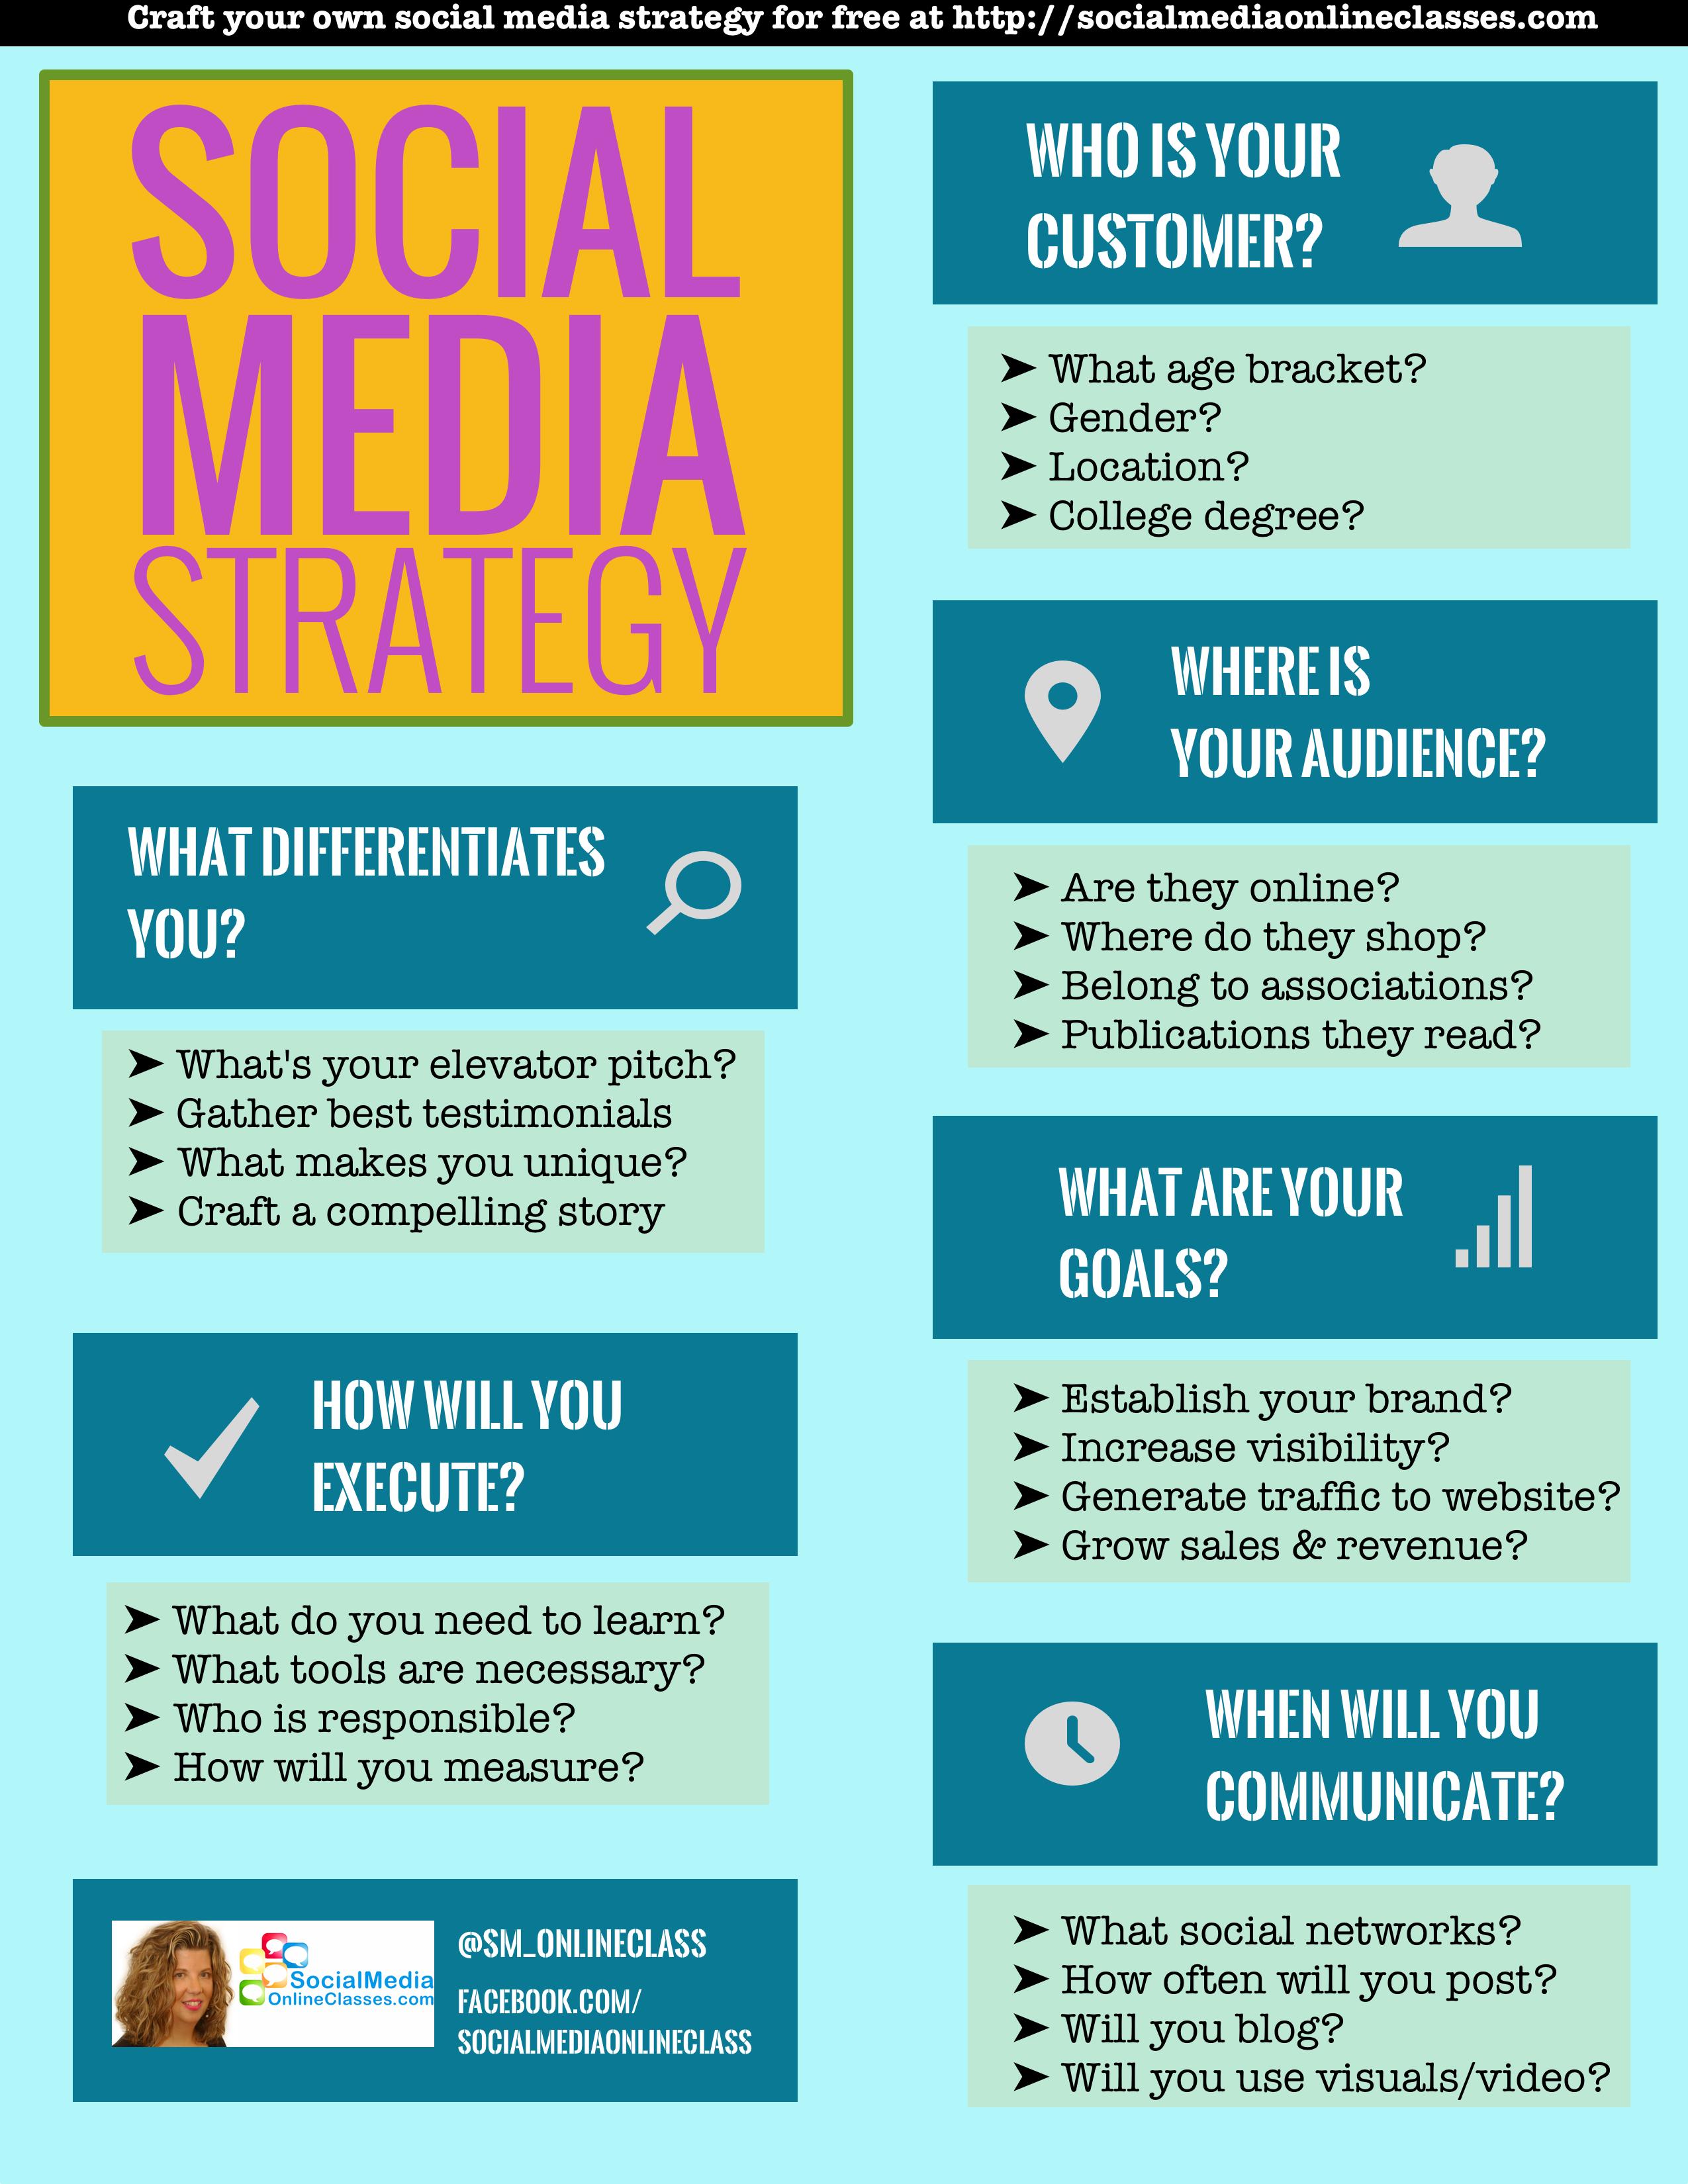 Httpsocialmediaonlineclassescomfreesocialmediastrategyclass - Social media marketing plan template